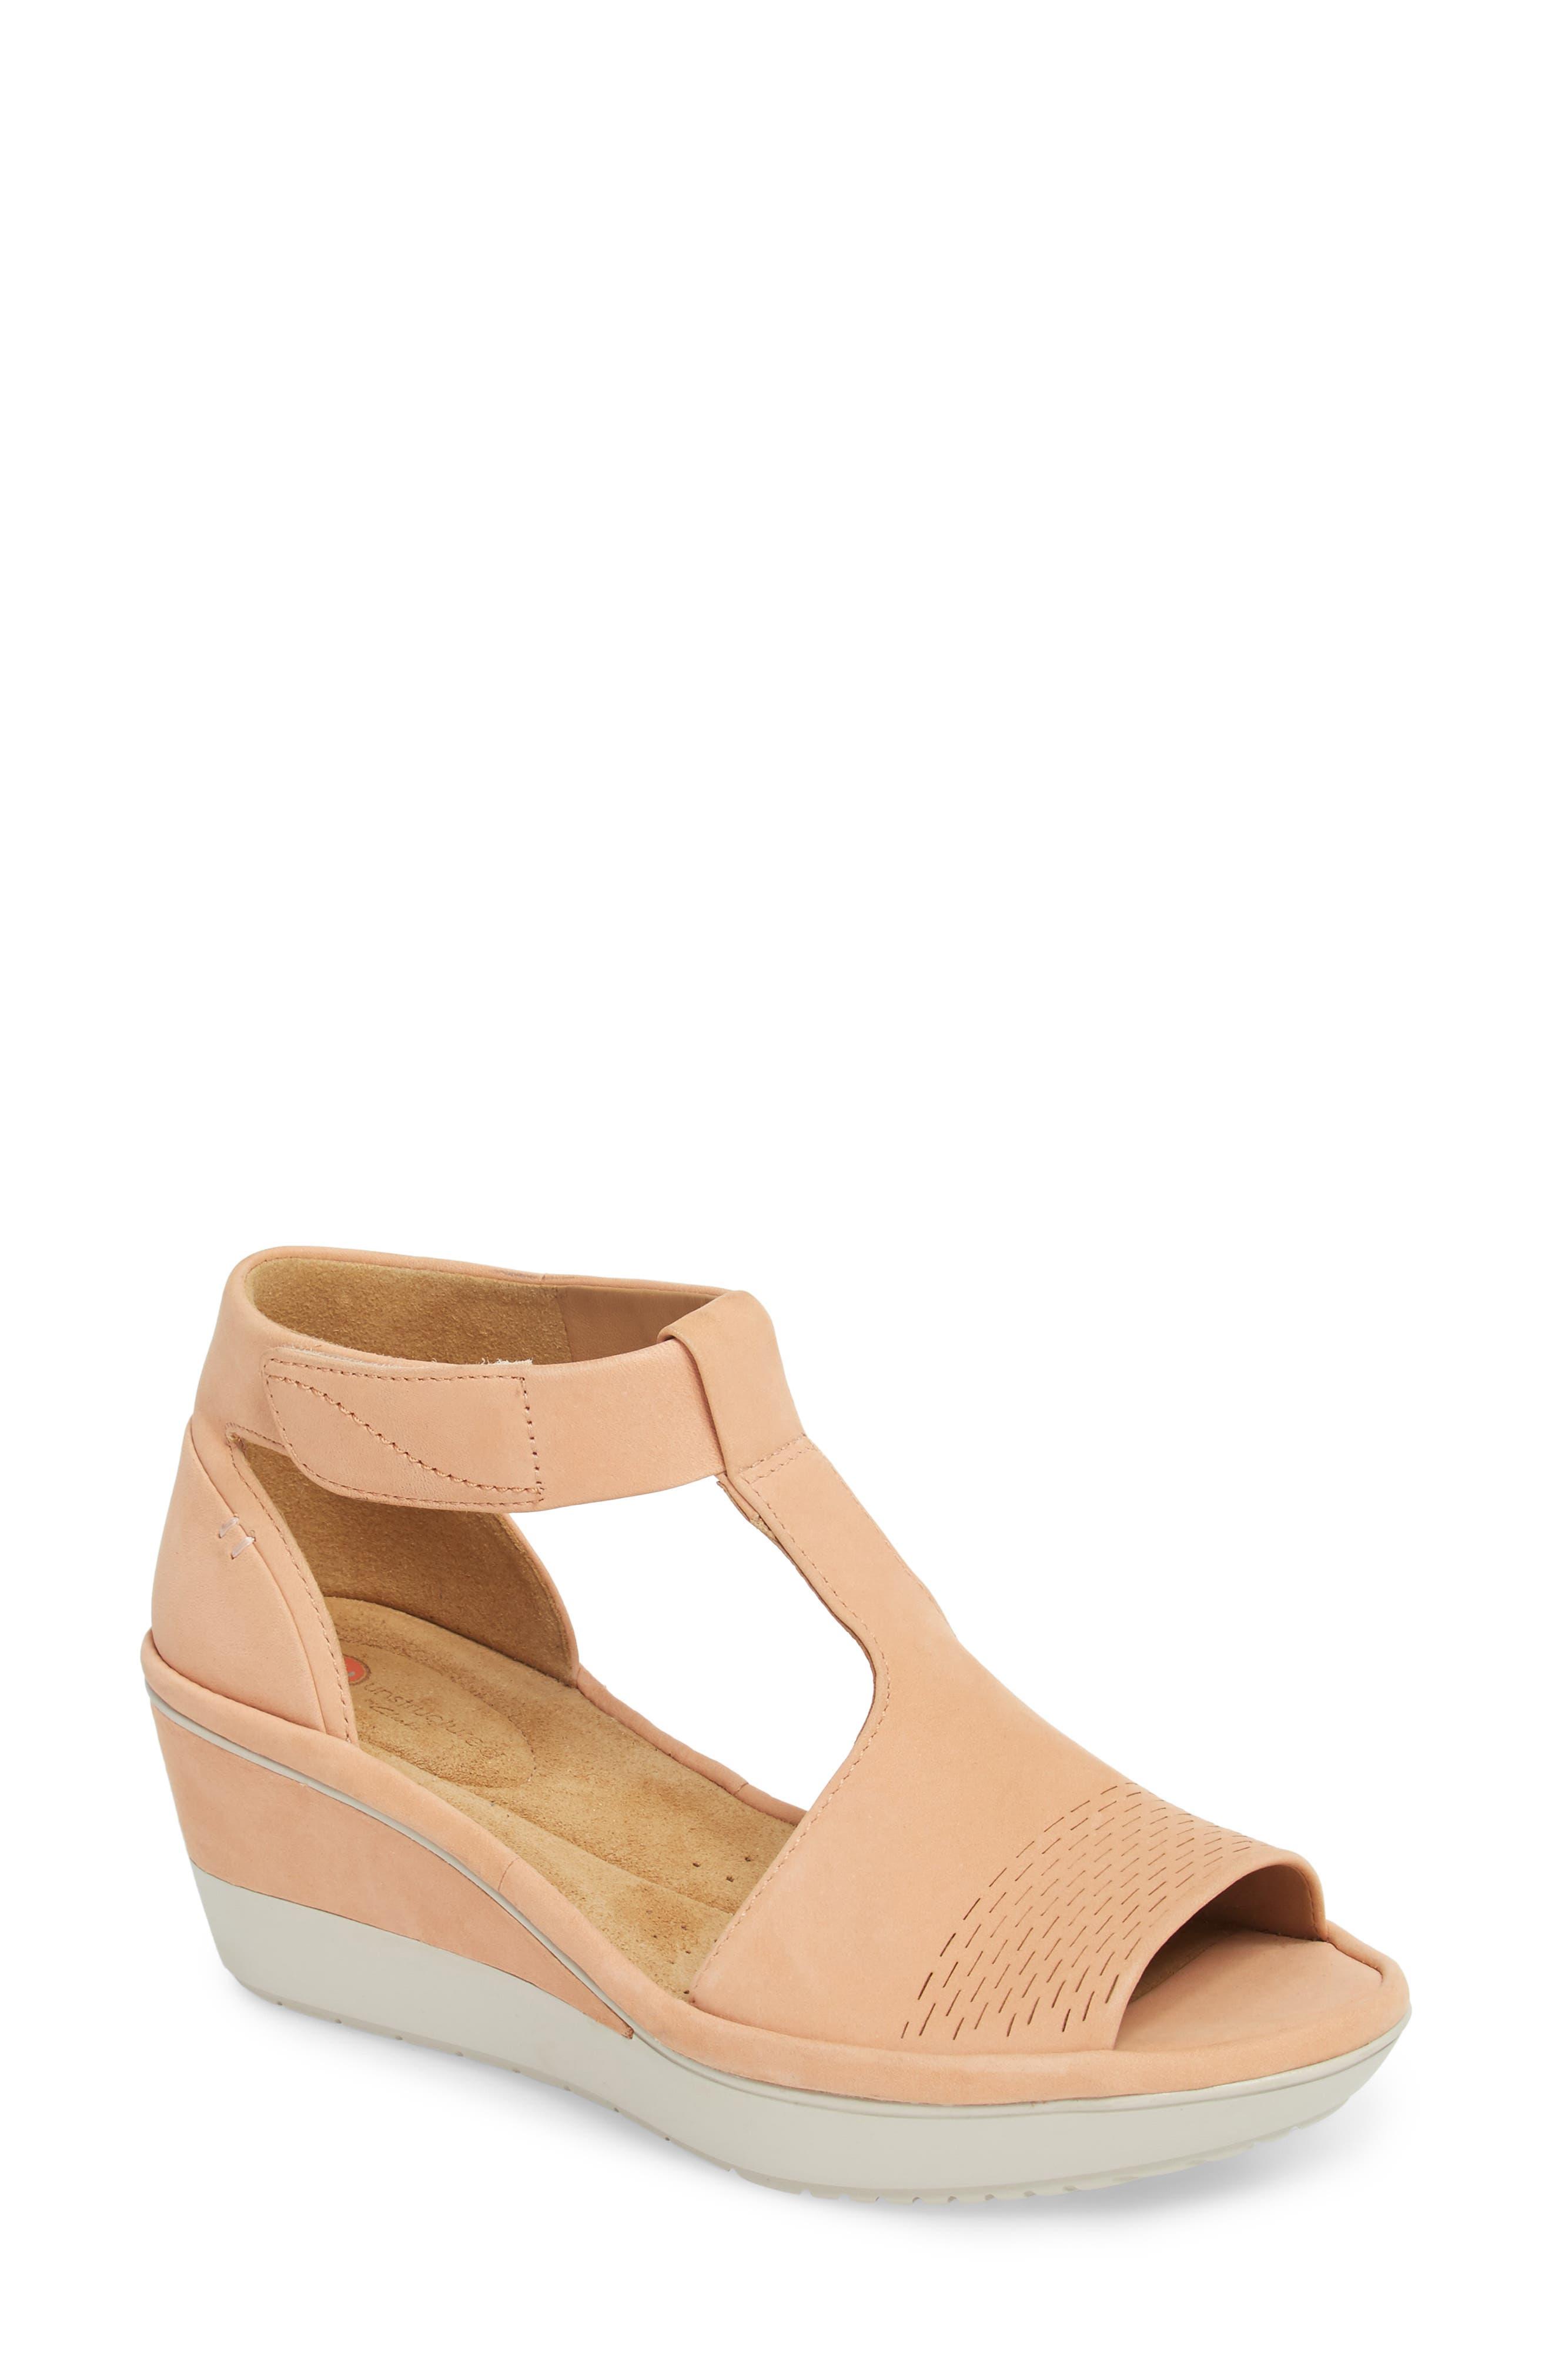 Wynnmere Avah T-Strap Wedge Sandal,                             Main thumbnail 1, color,                             Peach Nubuck